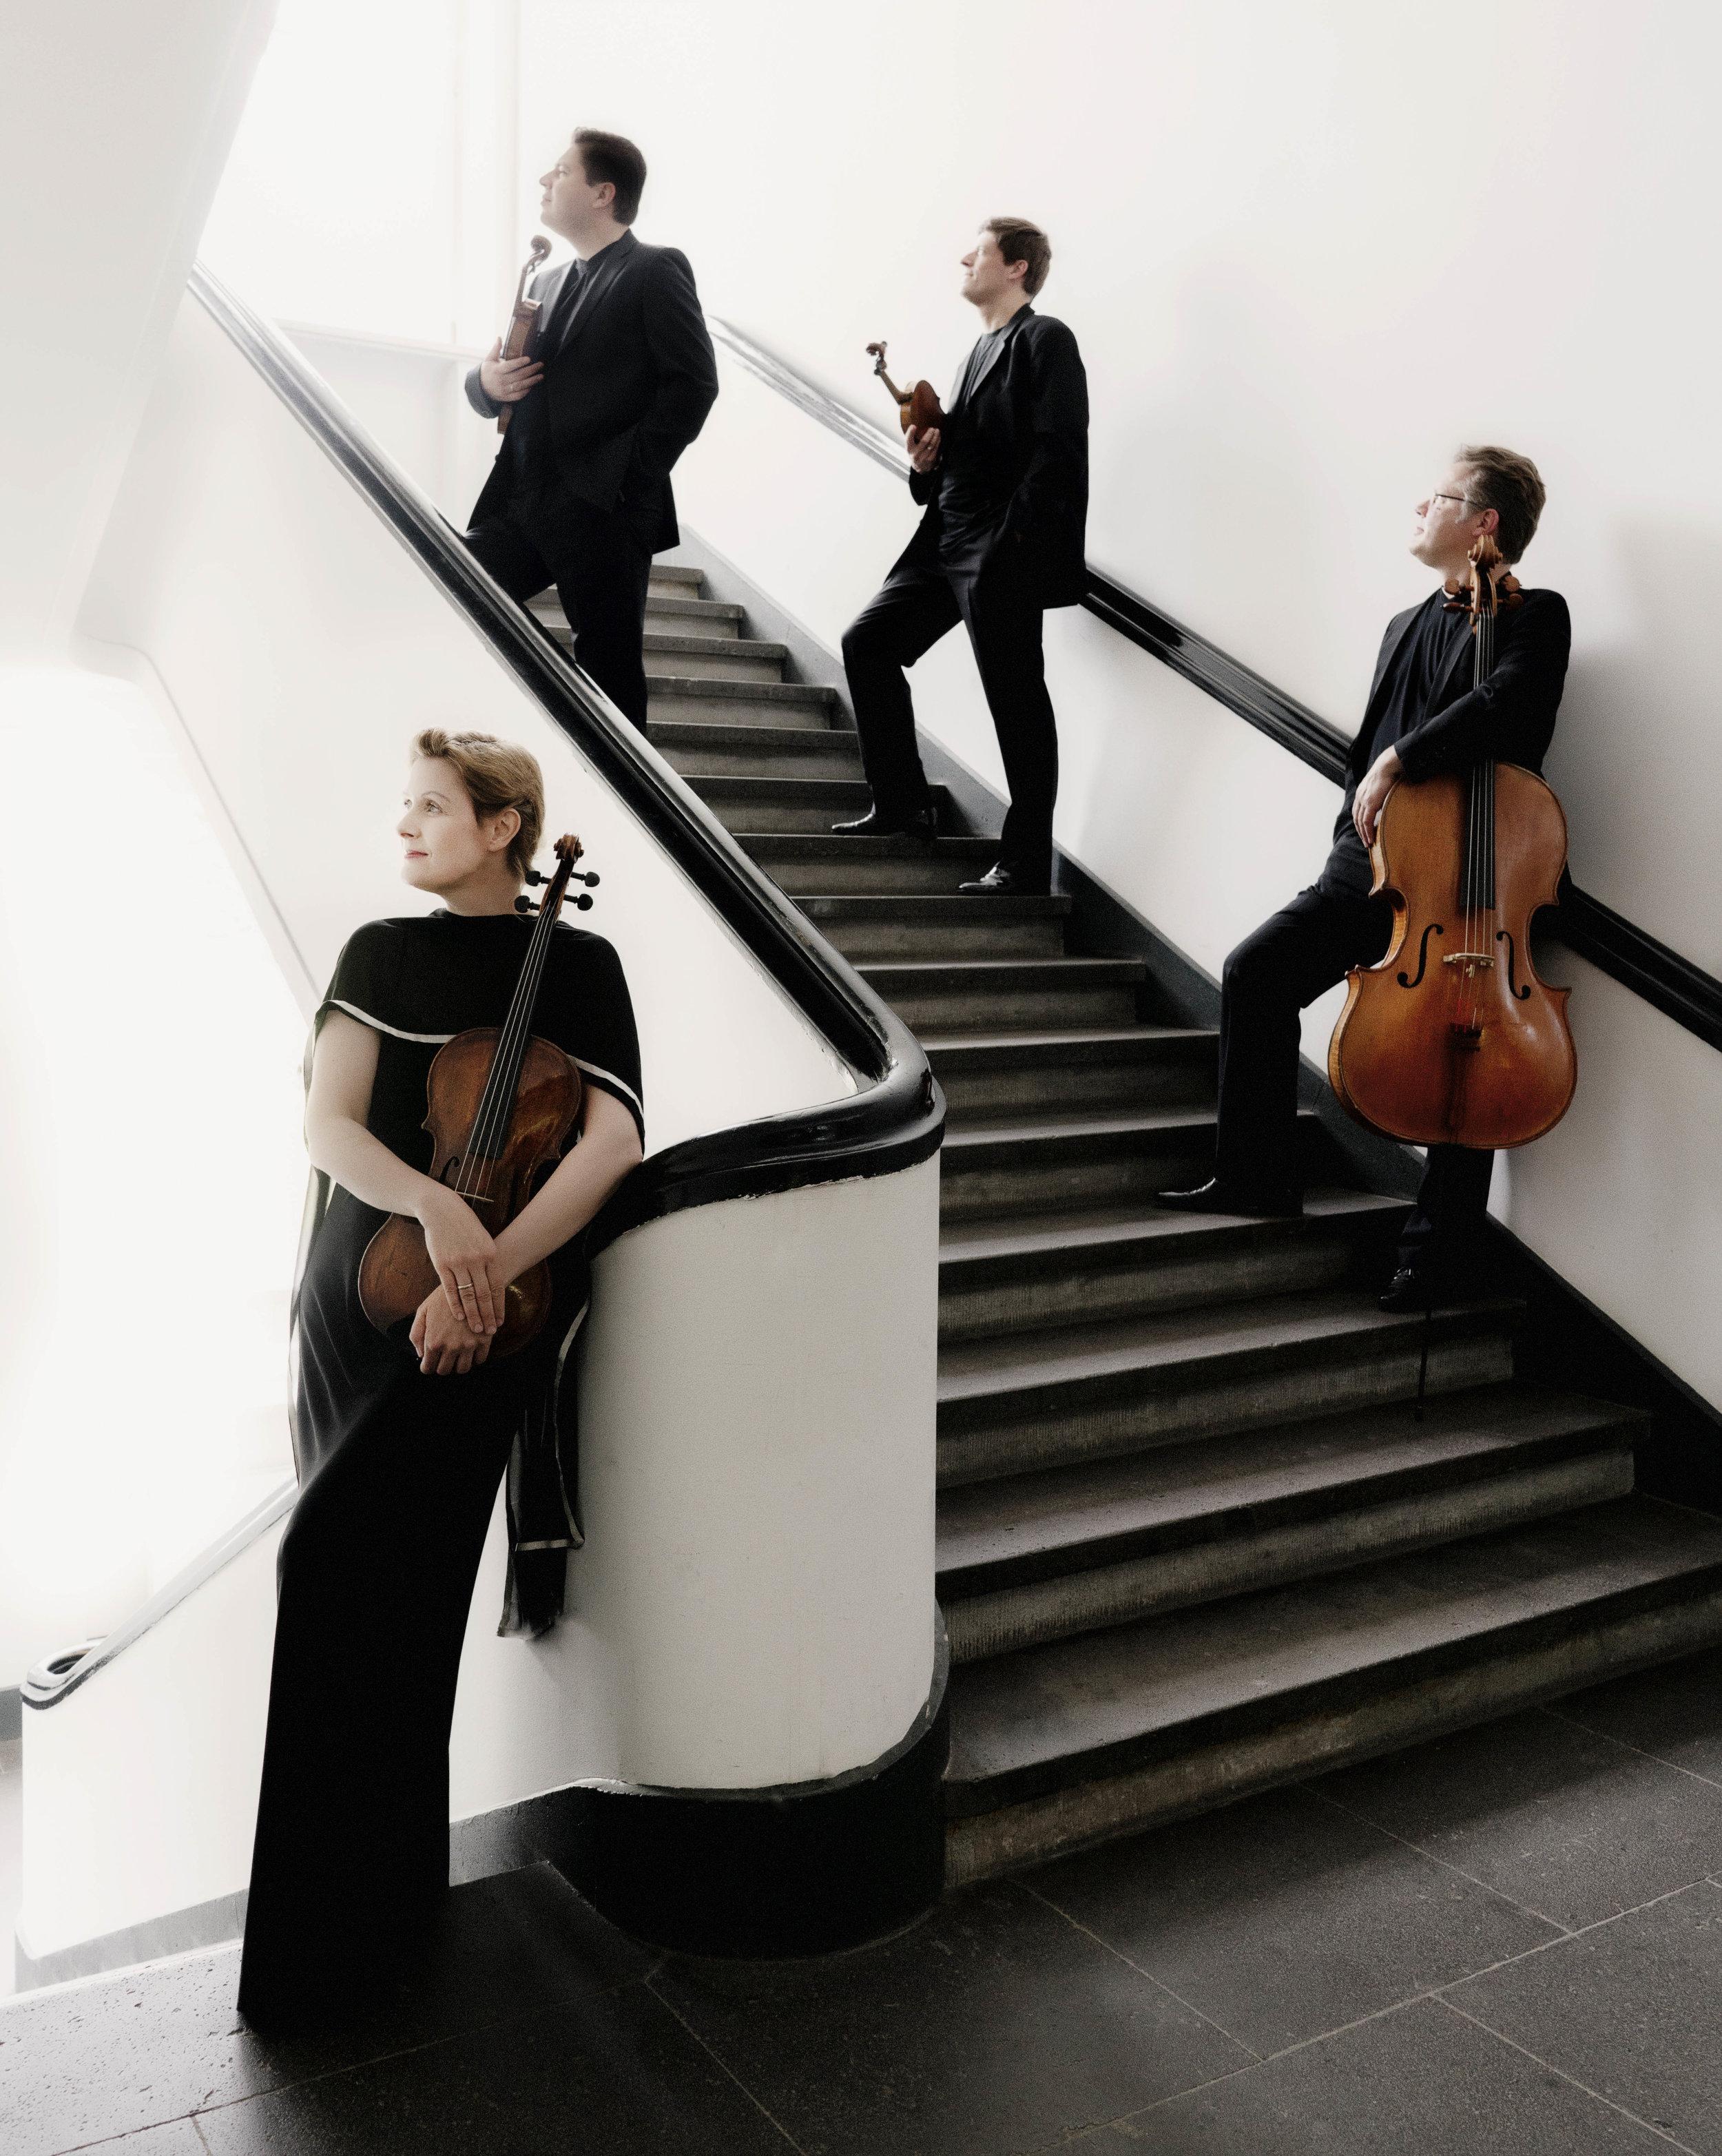 Henschel Quartett standing on stairs.jpg